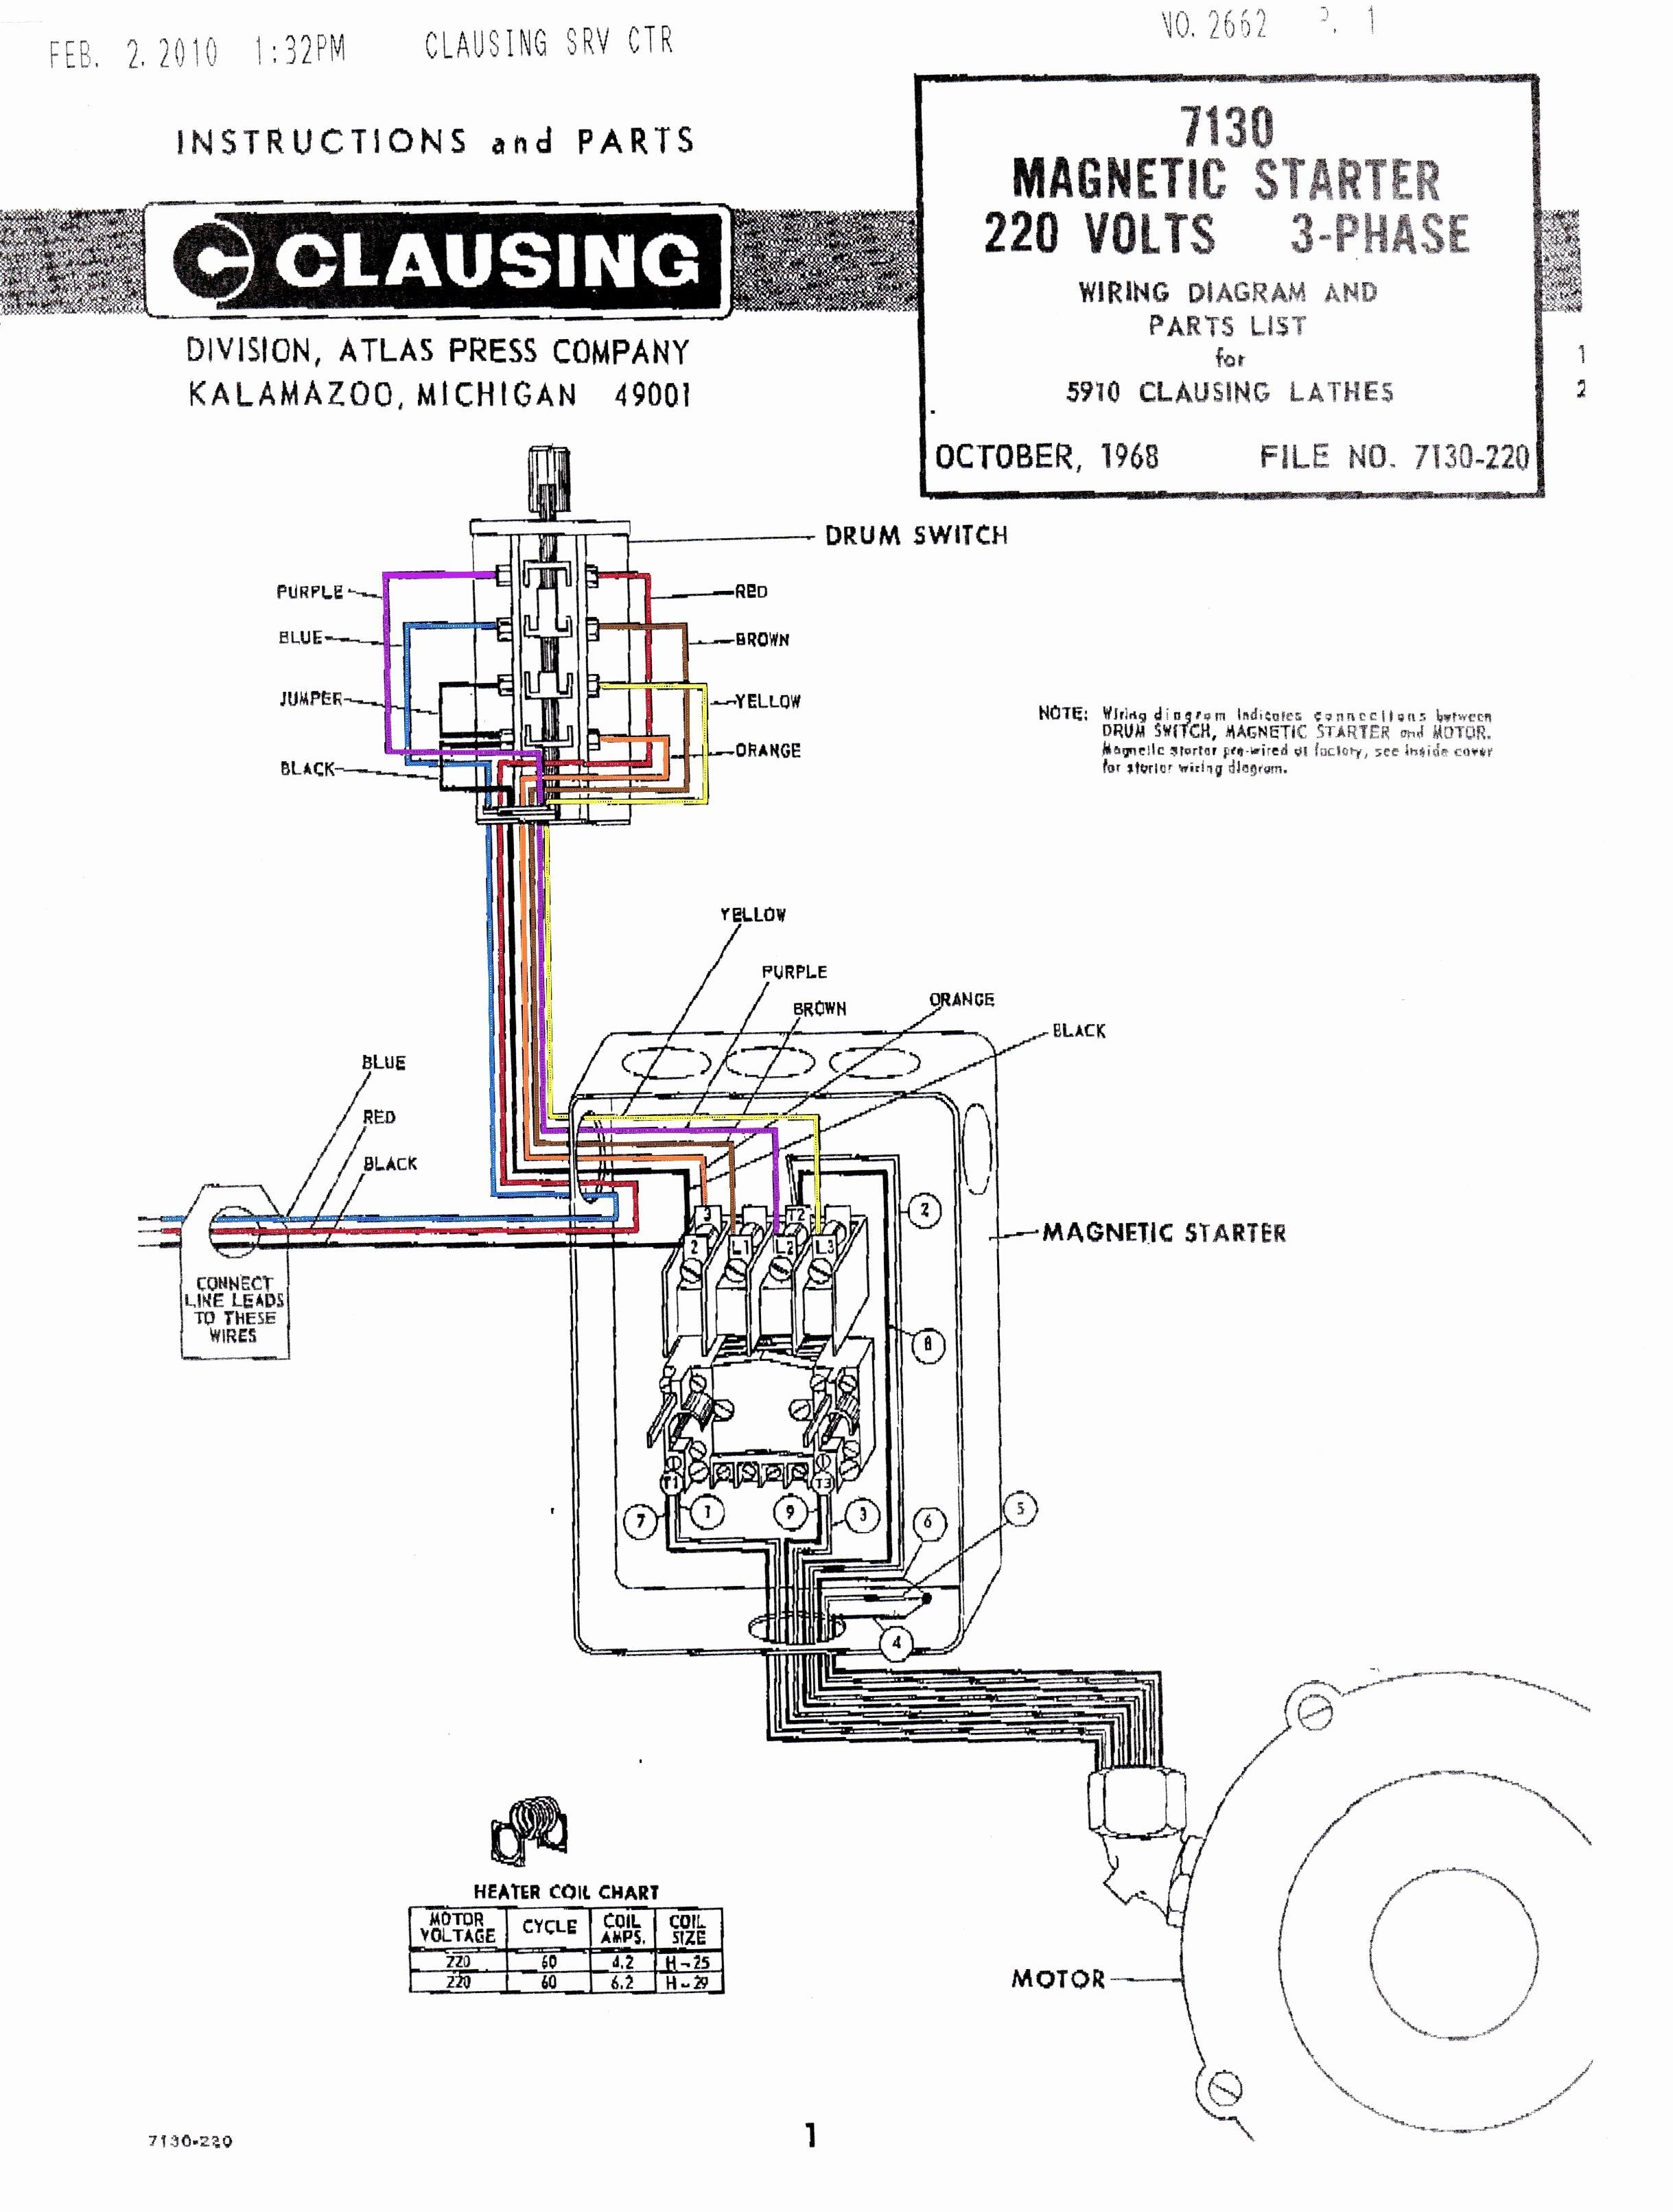 Super 3 Wire 220 Volt Wiring Diagram Wirings Diagram Wiring Cloud Licukshollocom